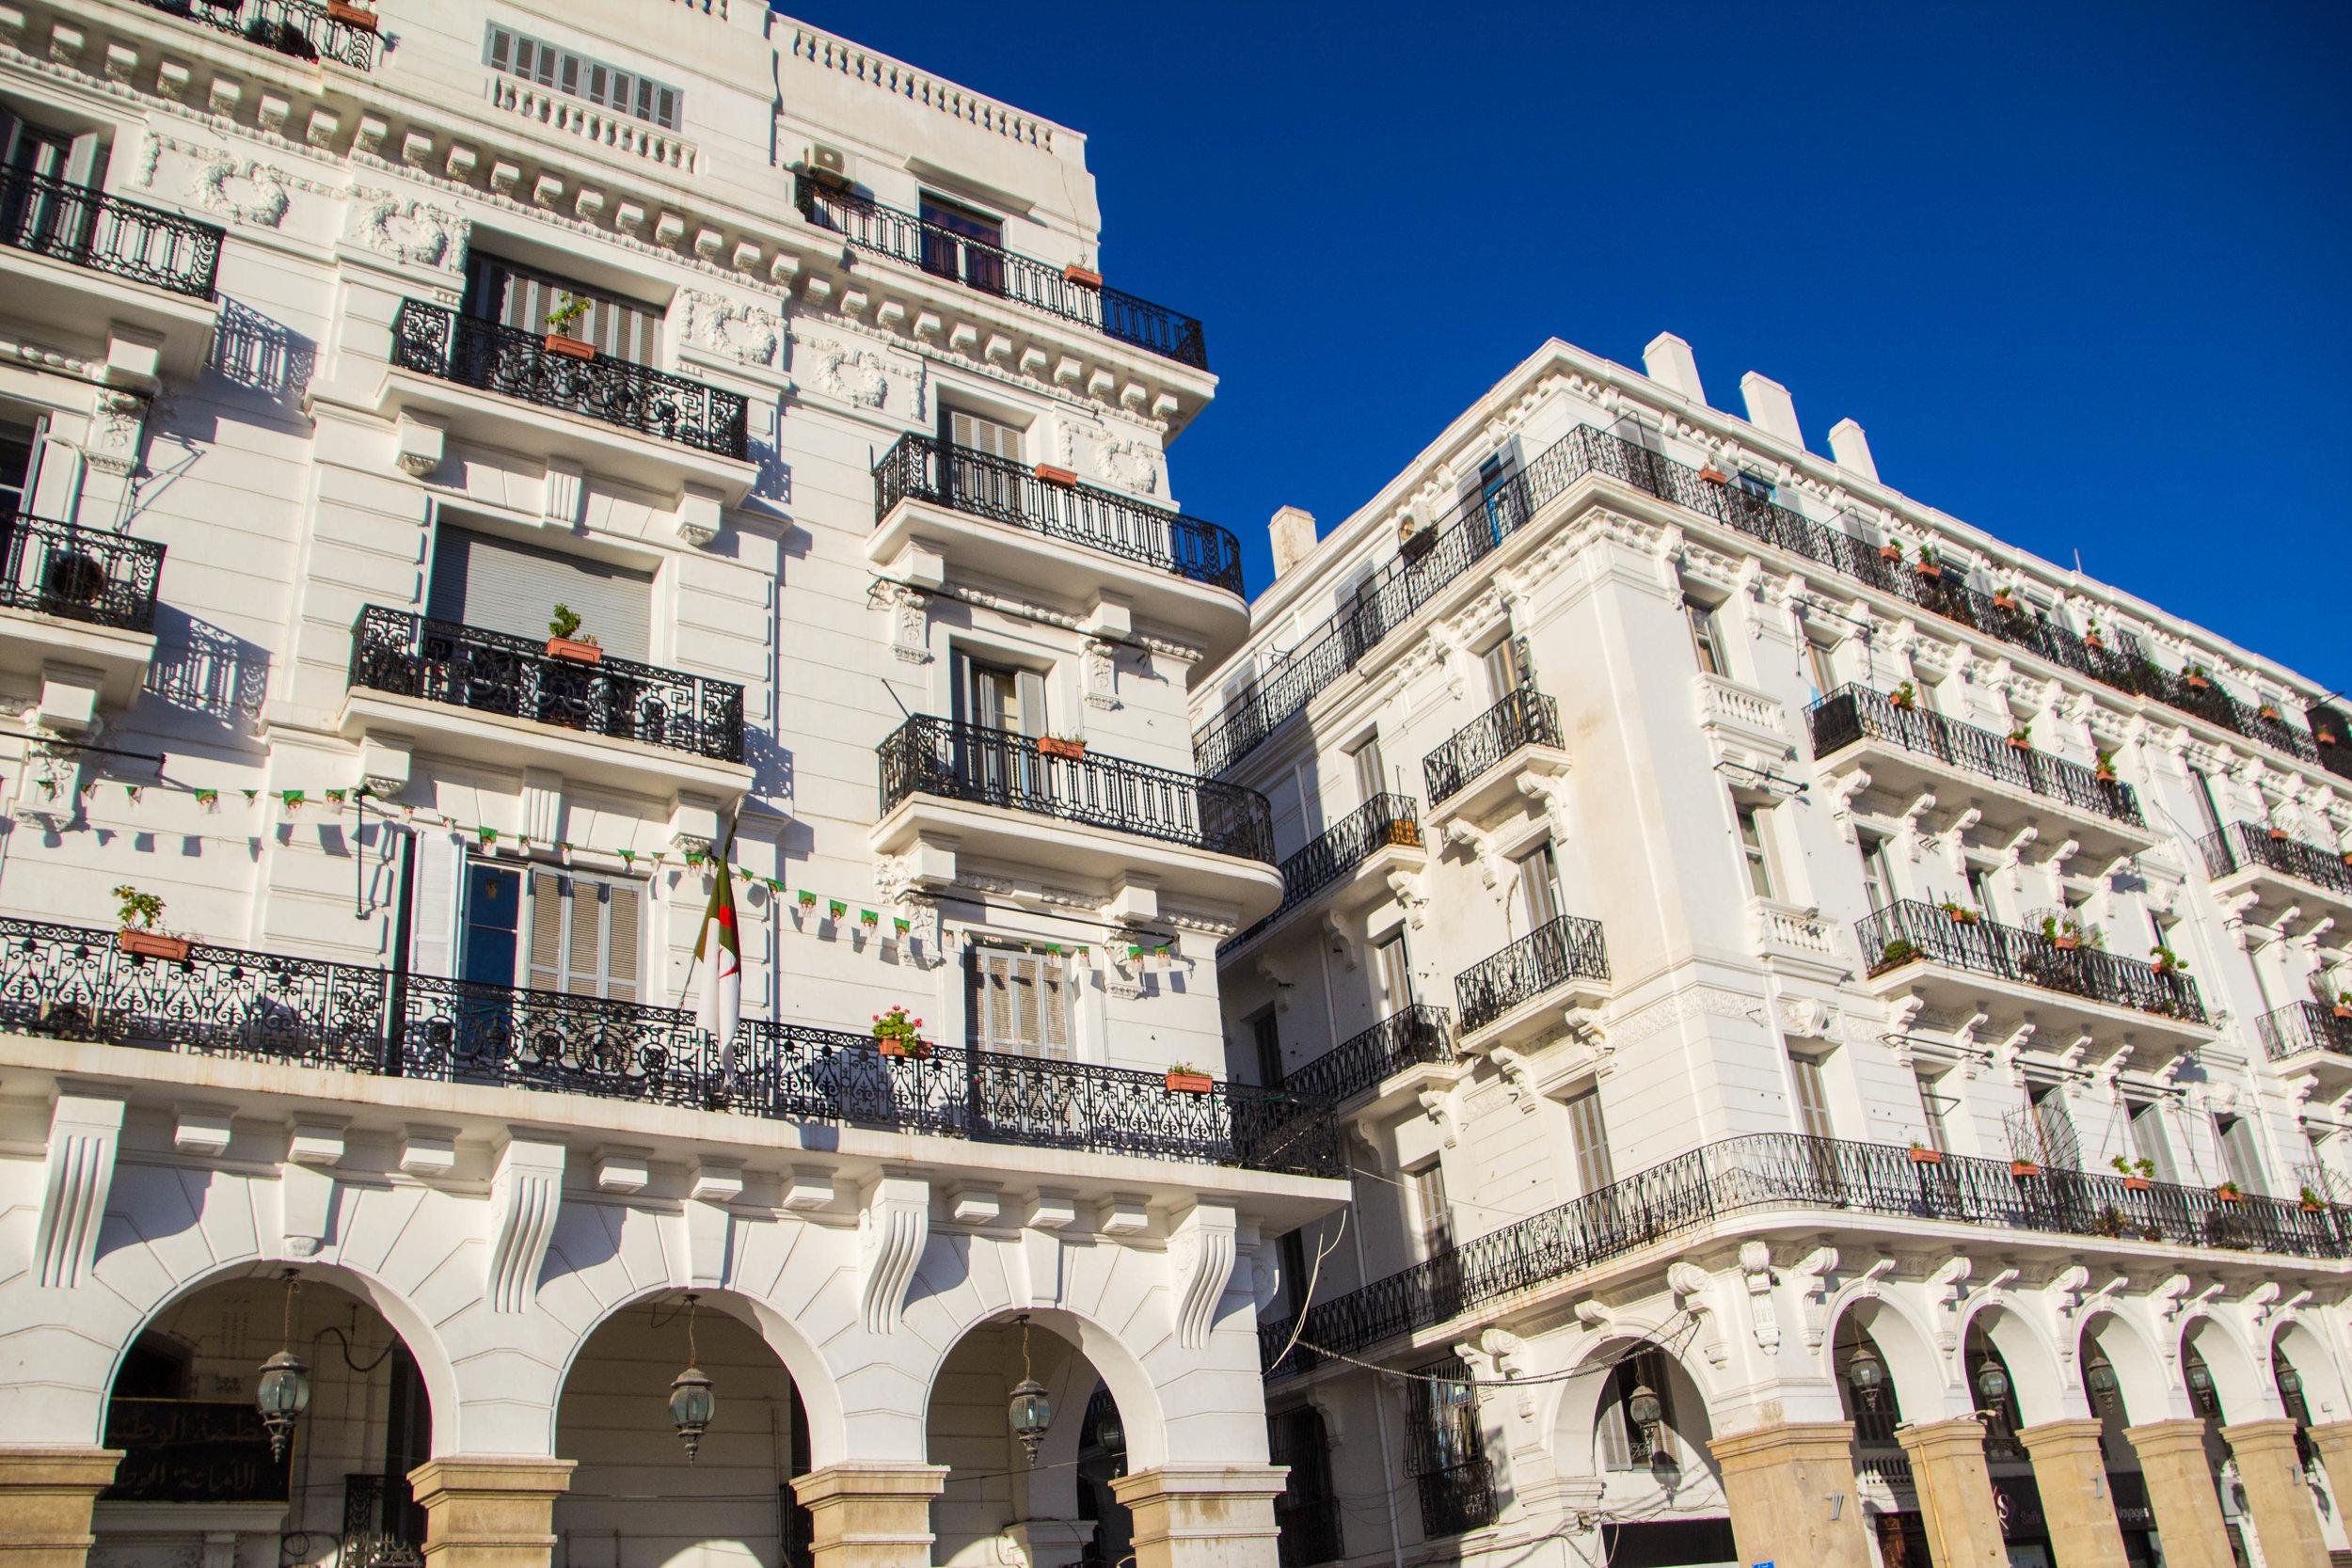 street-photography-algiers-algeria-13.jpg